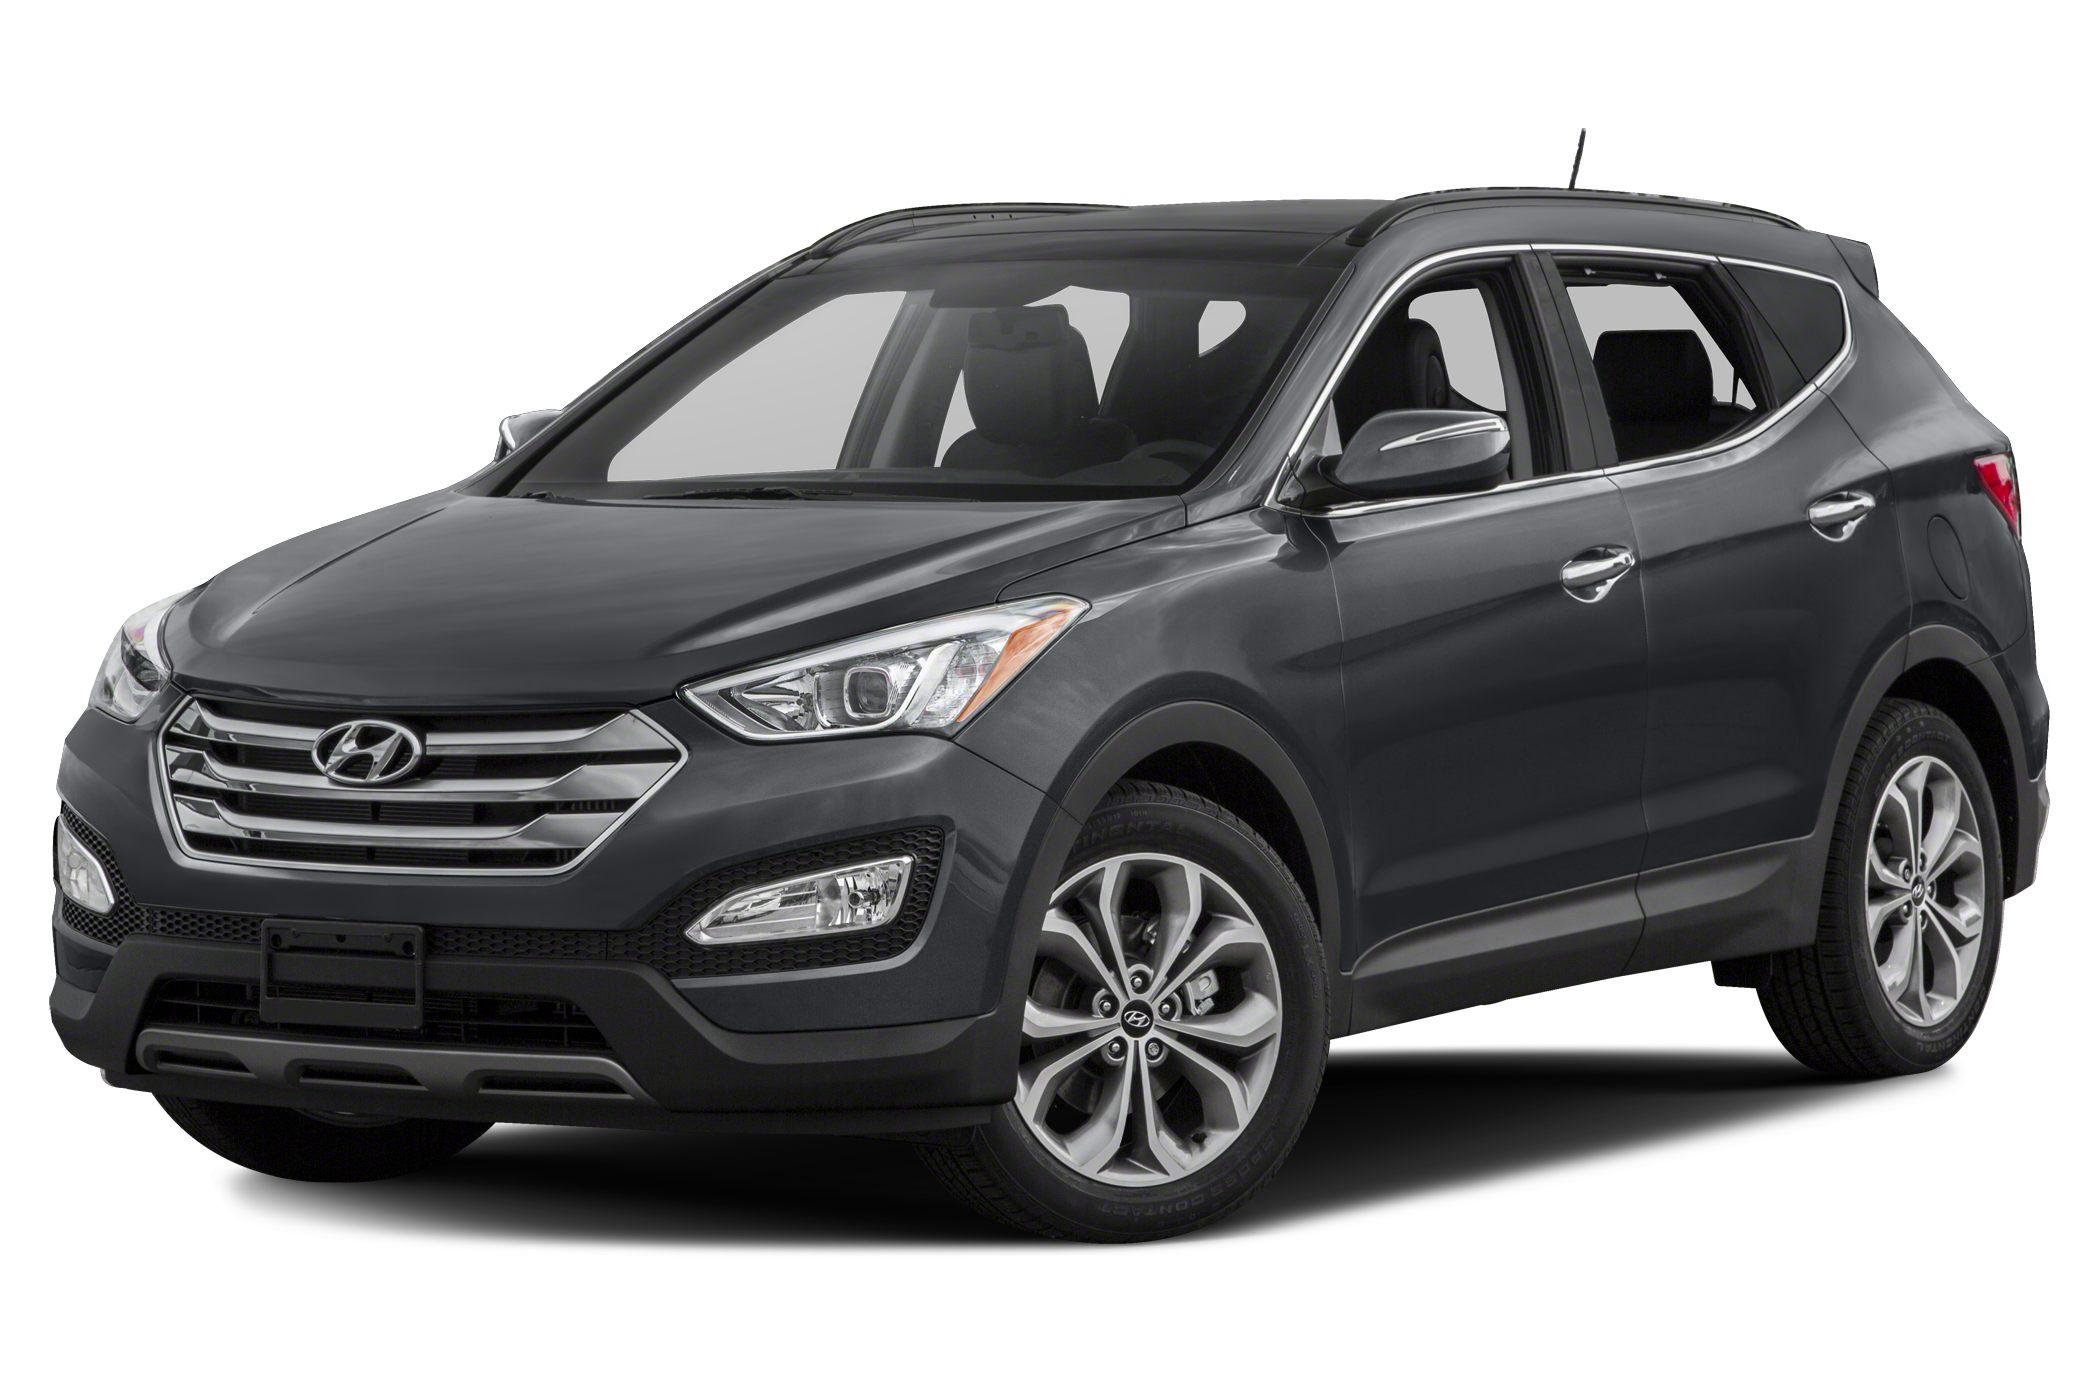 Honda cr v updated for 2015 autoblog for Hyundai santa fe sport vs honda crv